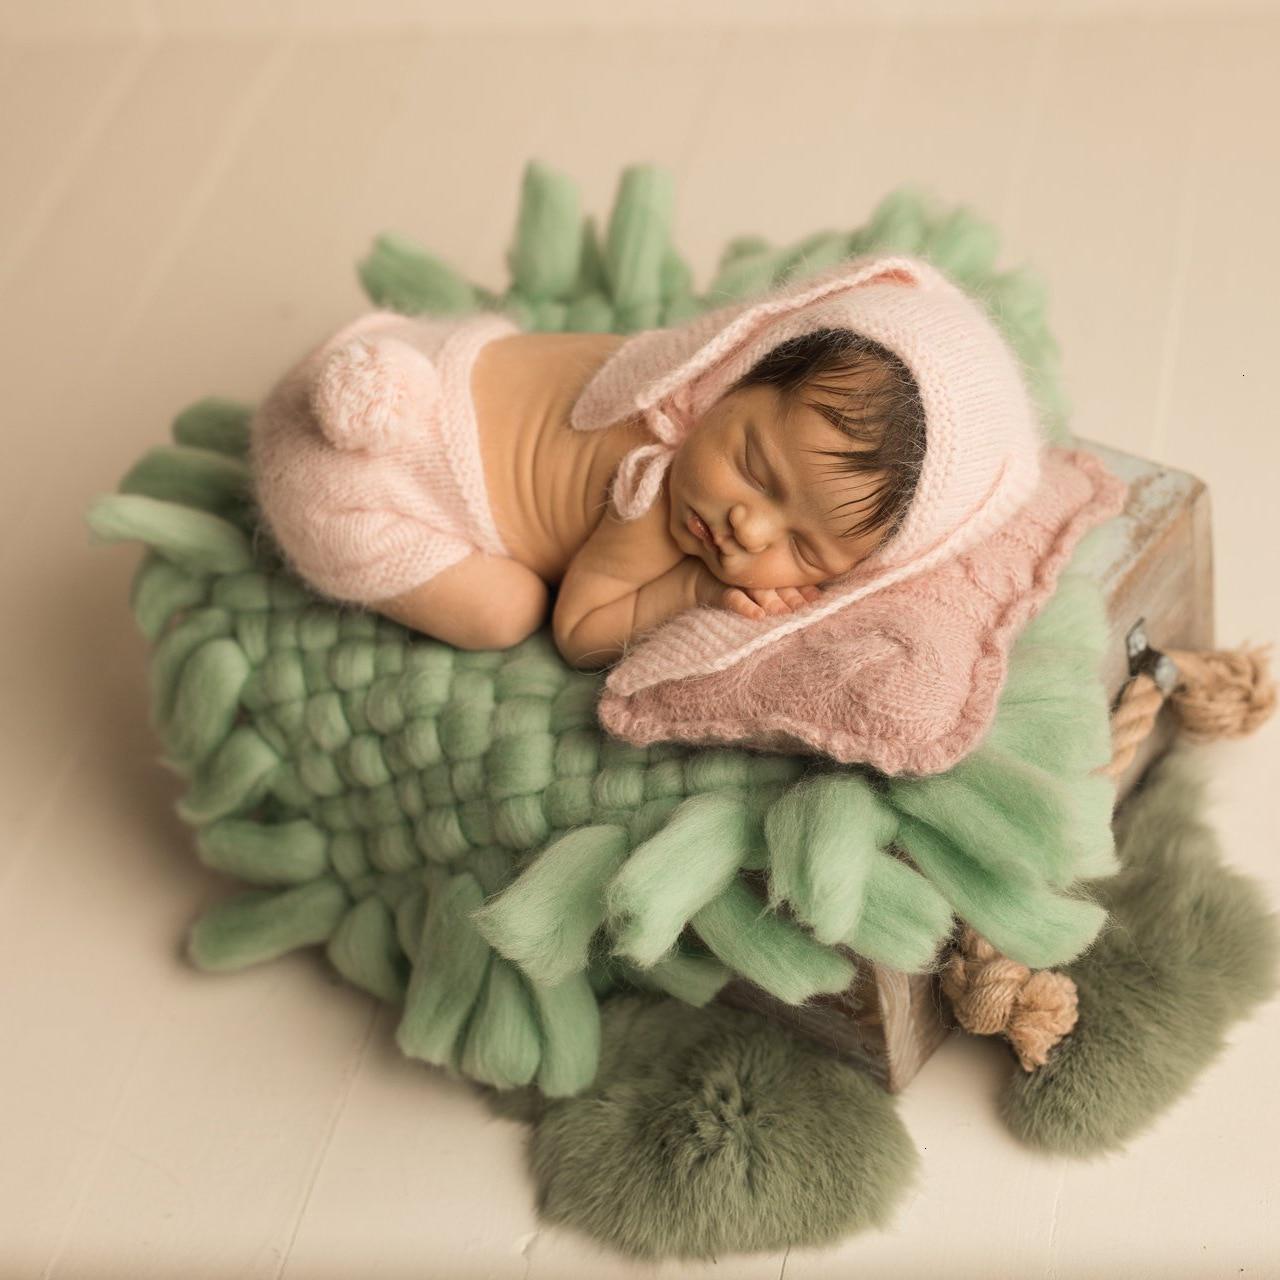 Newborn Photography Props Accessories Crochet Chunky Blanket Newborn Shoot Backdrop Square Blanket 45*45cm Basket Stuffer Filler